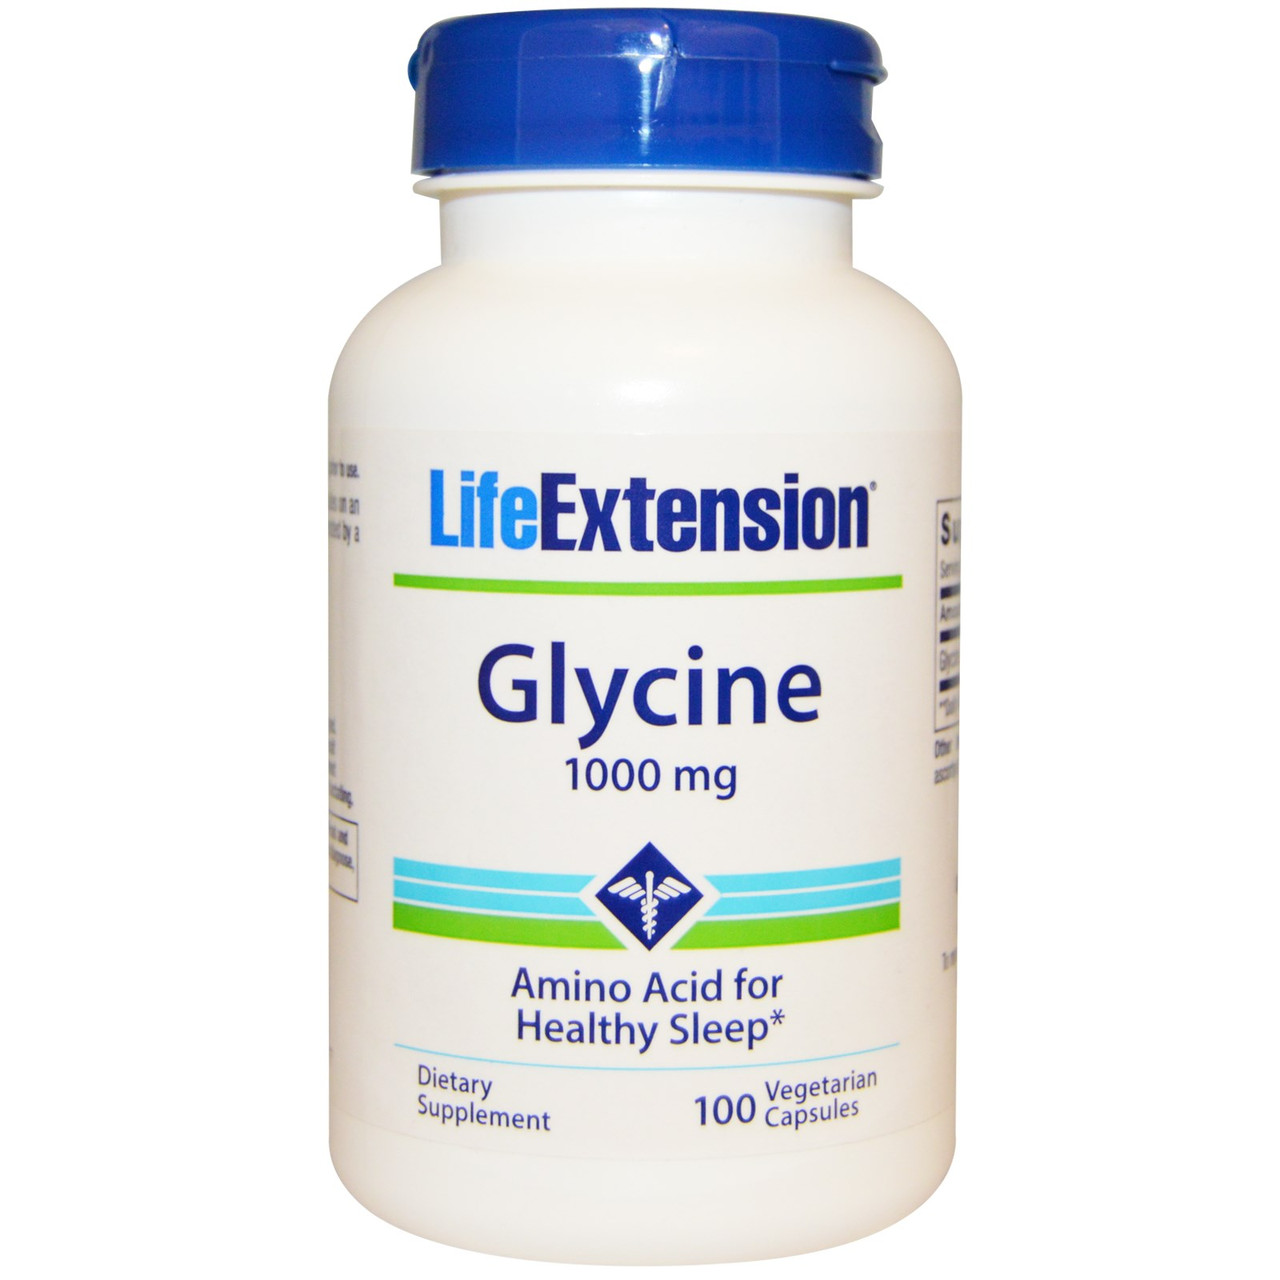 Глицин, 1000 мг, Life Extension, 100 вегетарианских капсул